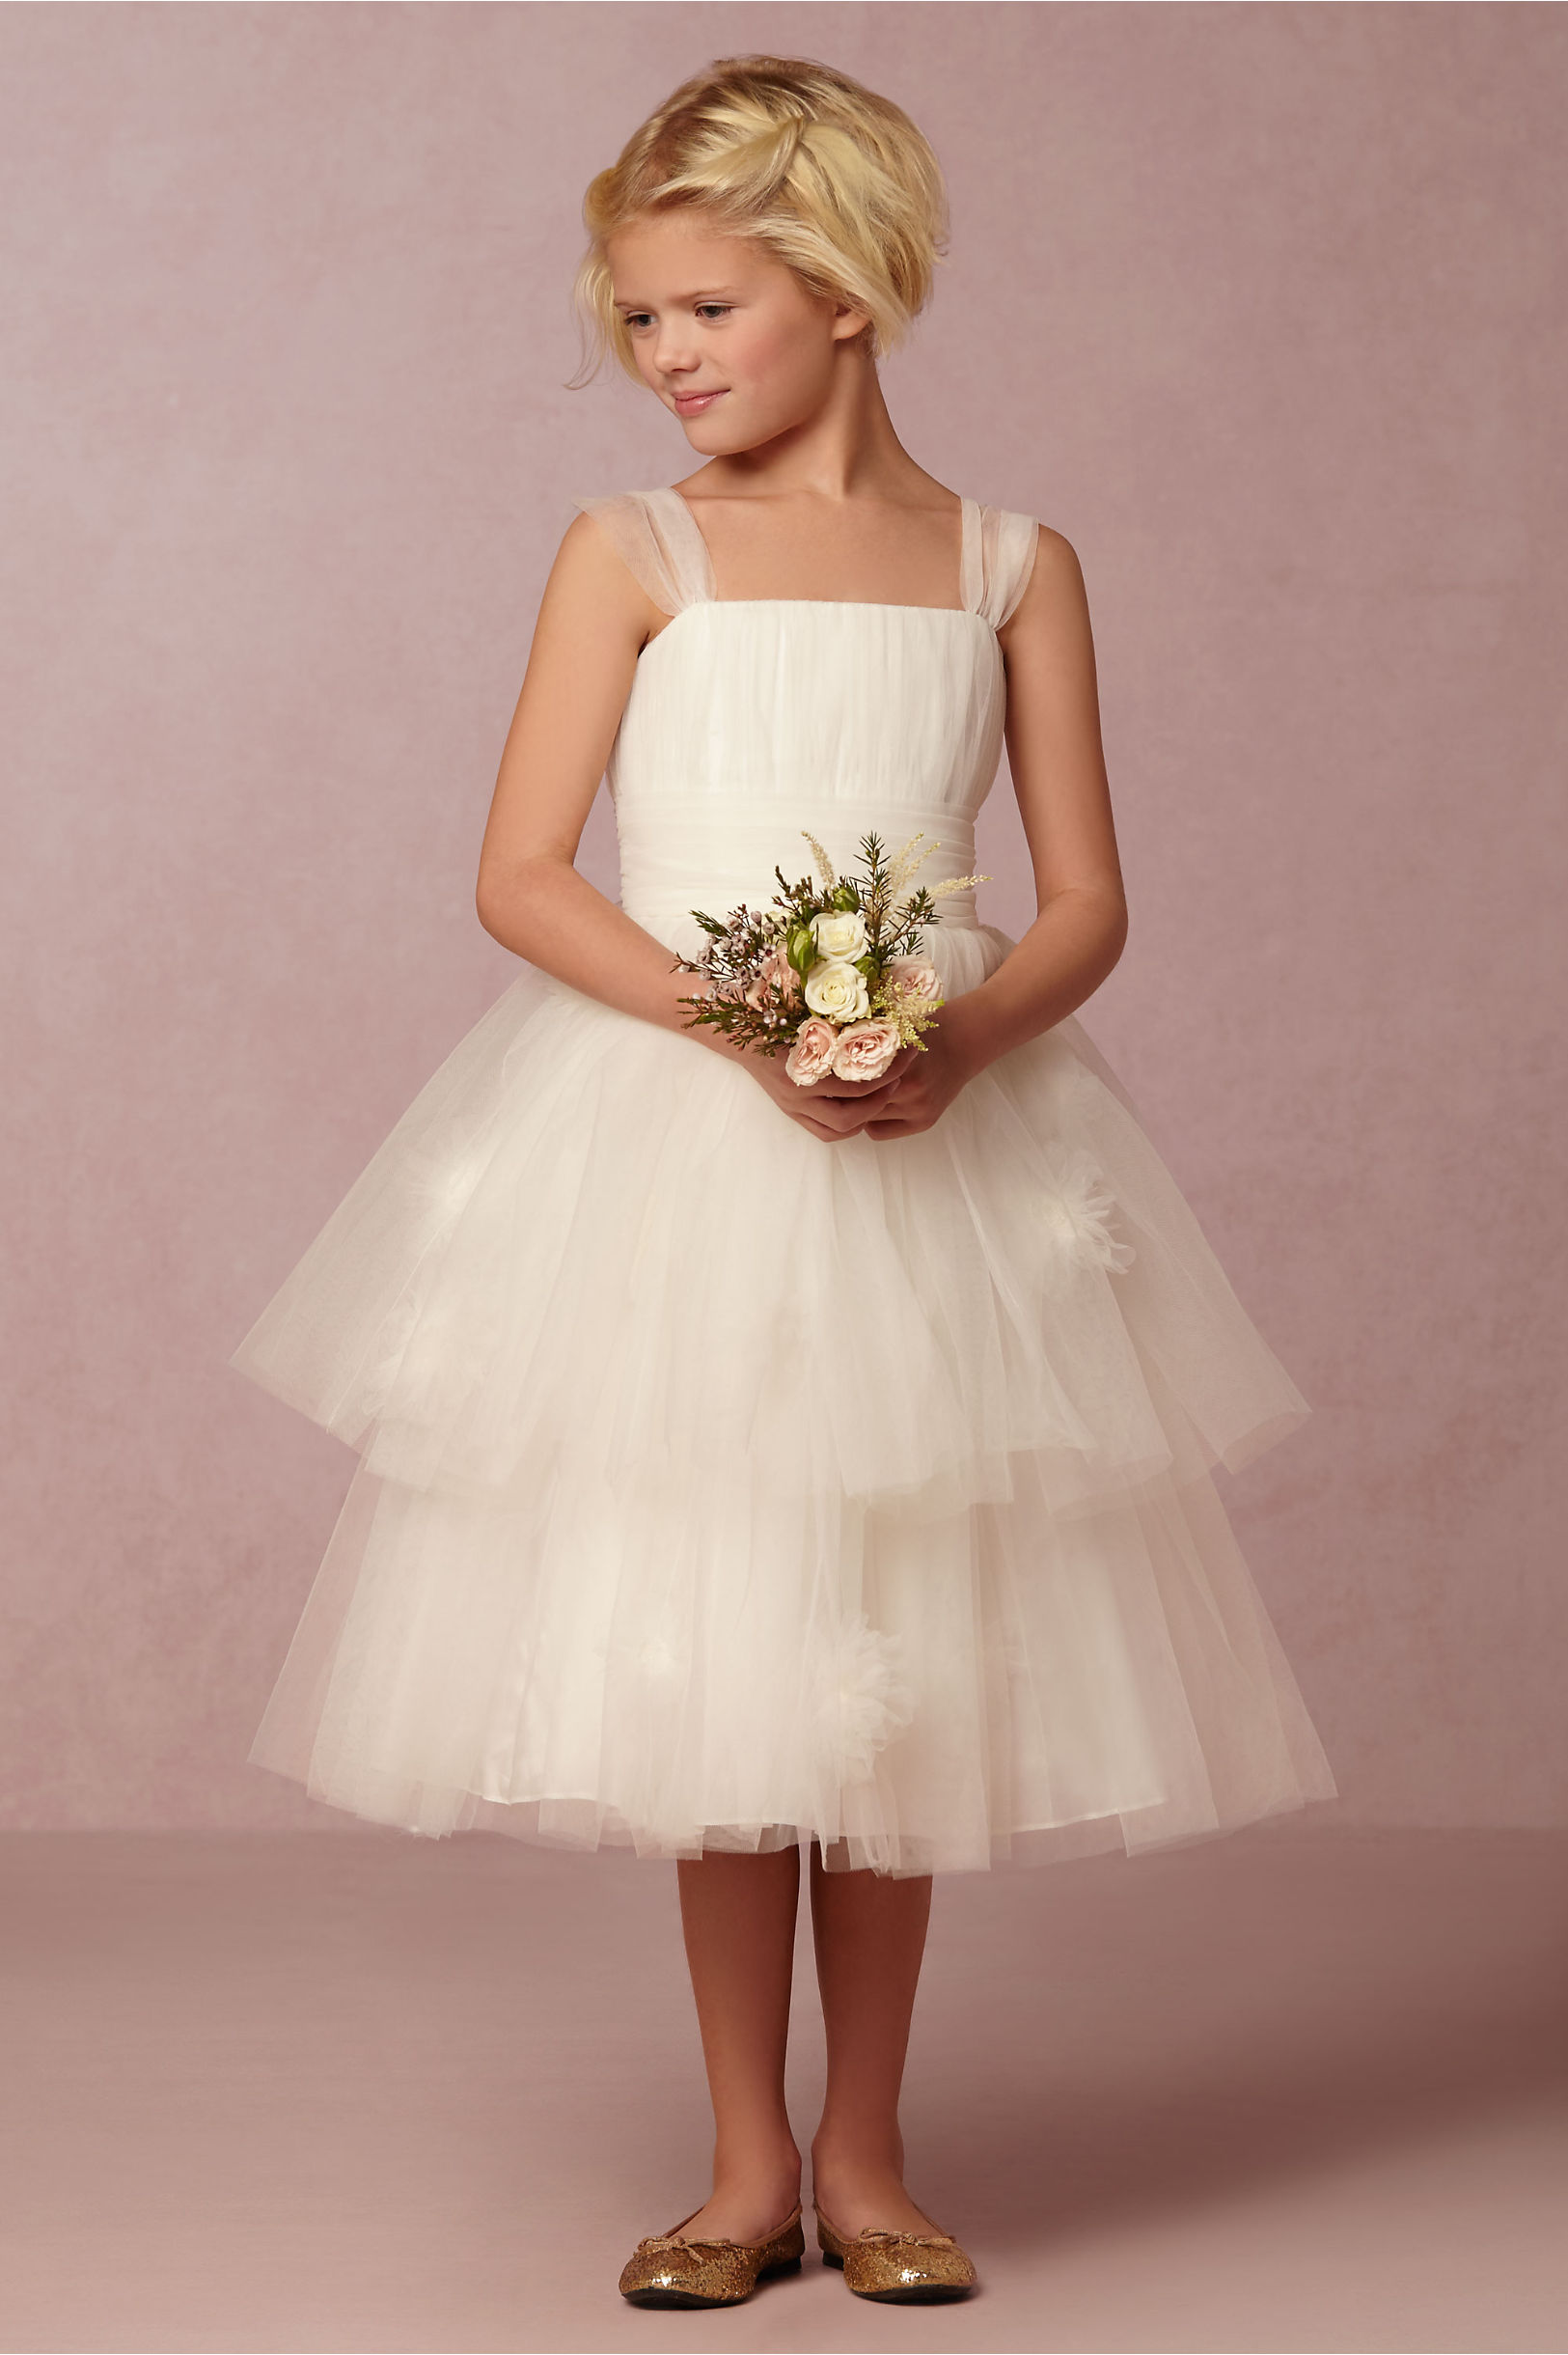 Colette Dress in Sale Dresses | BHLDN